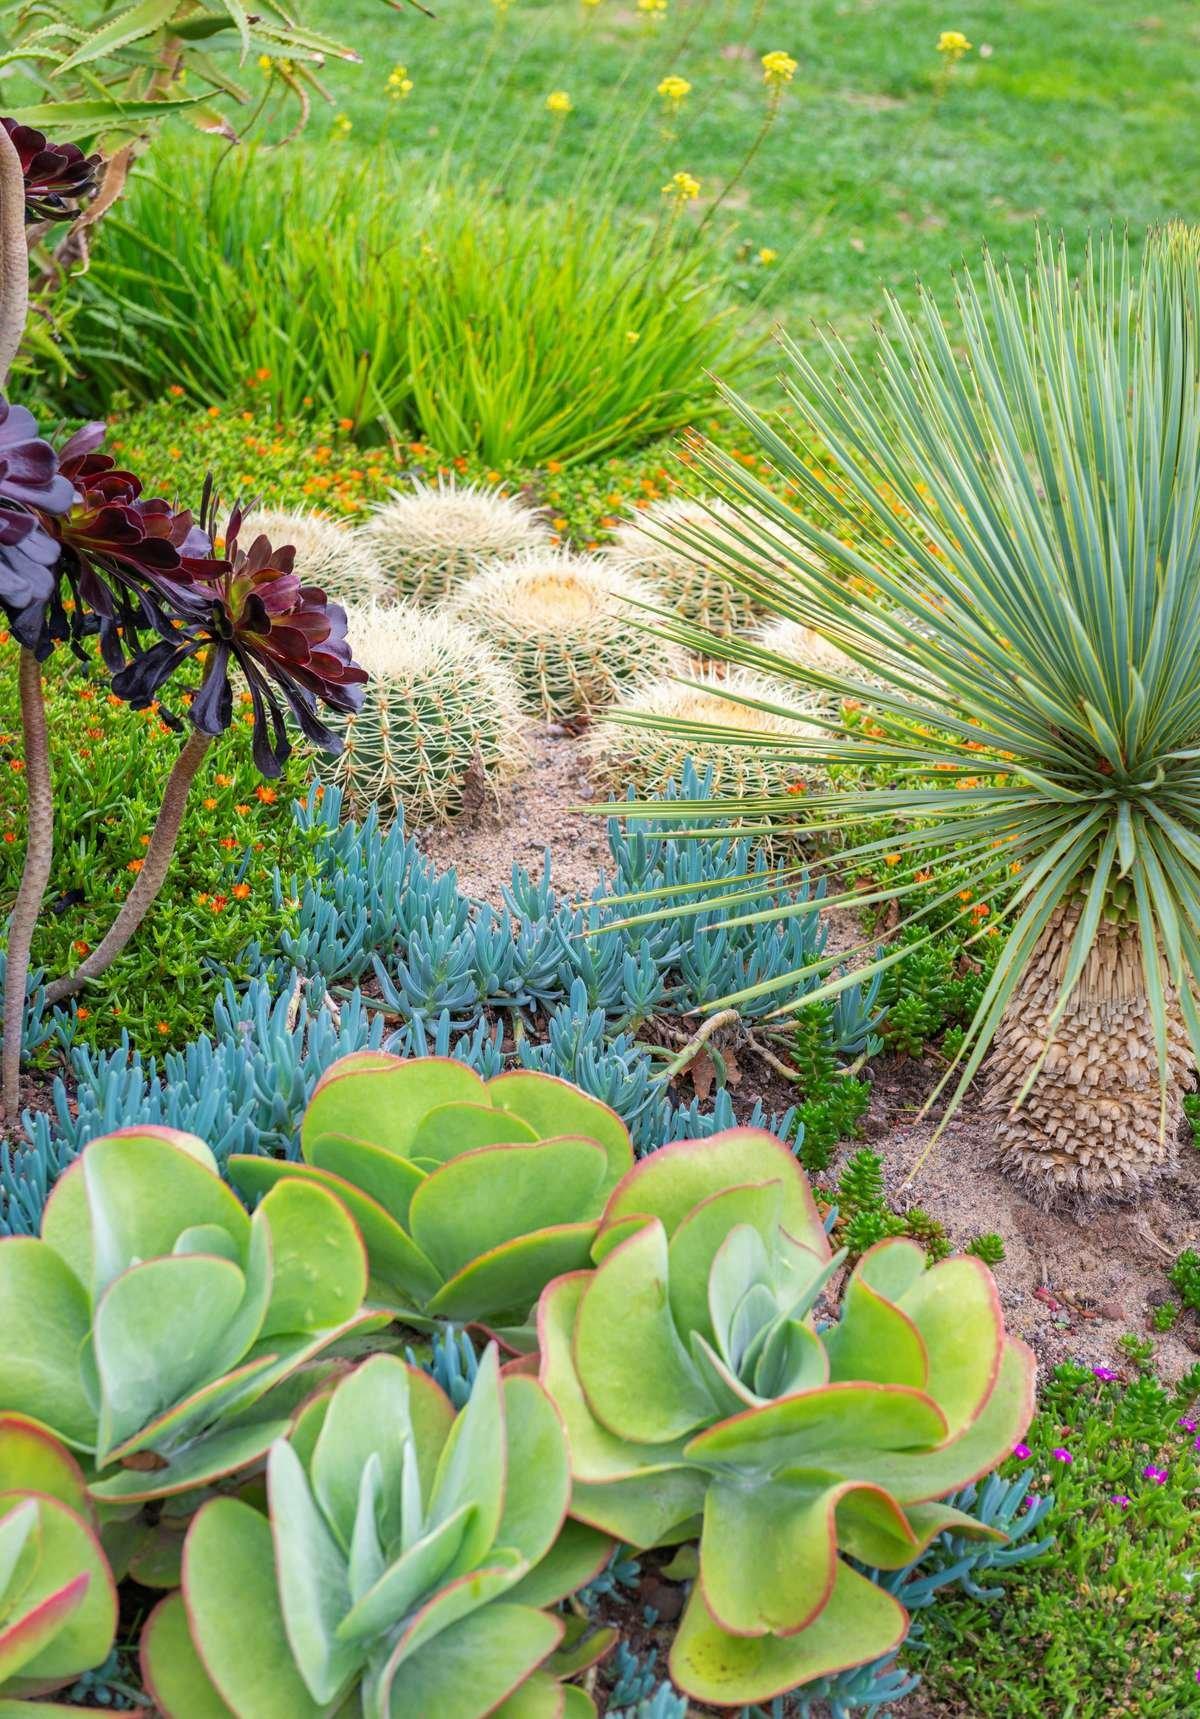 Succulents in a Landscape